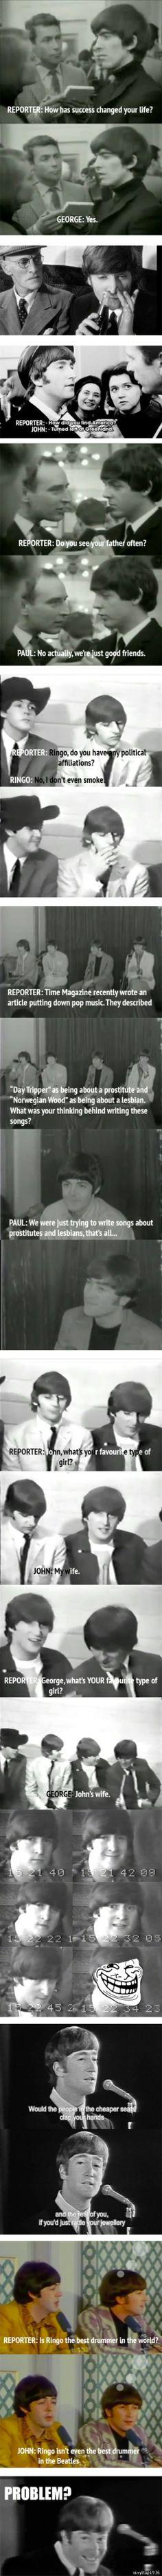 The Beatles OMG